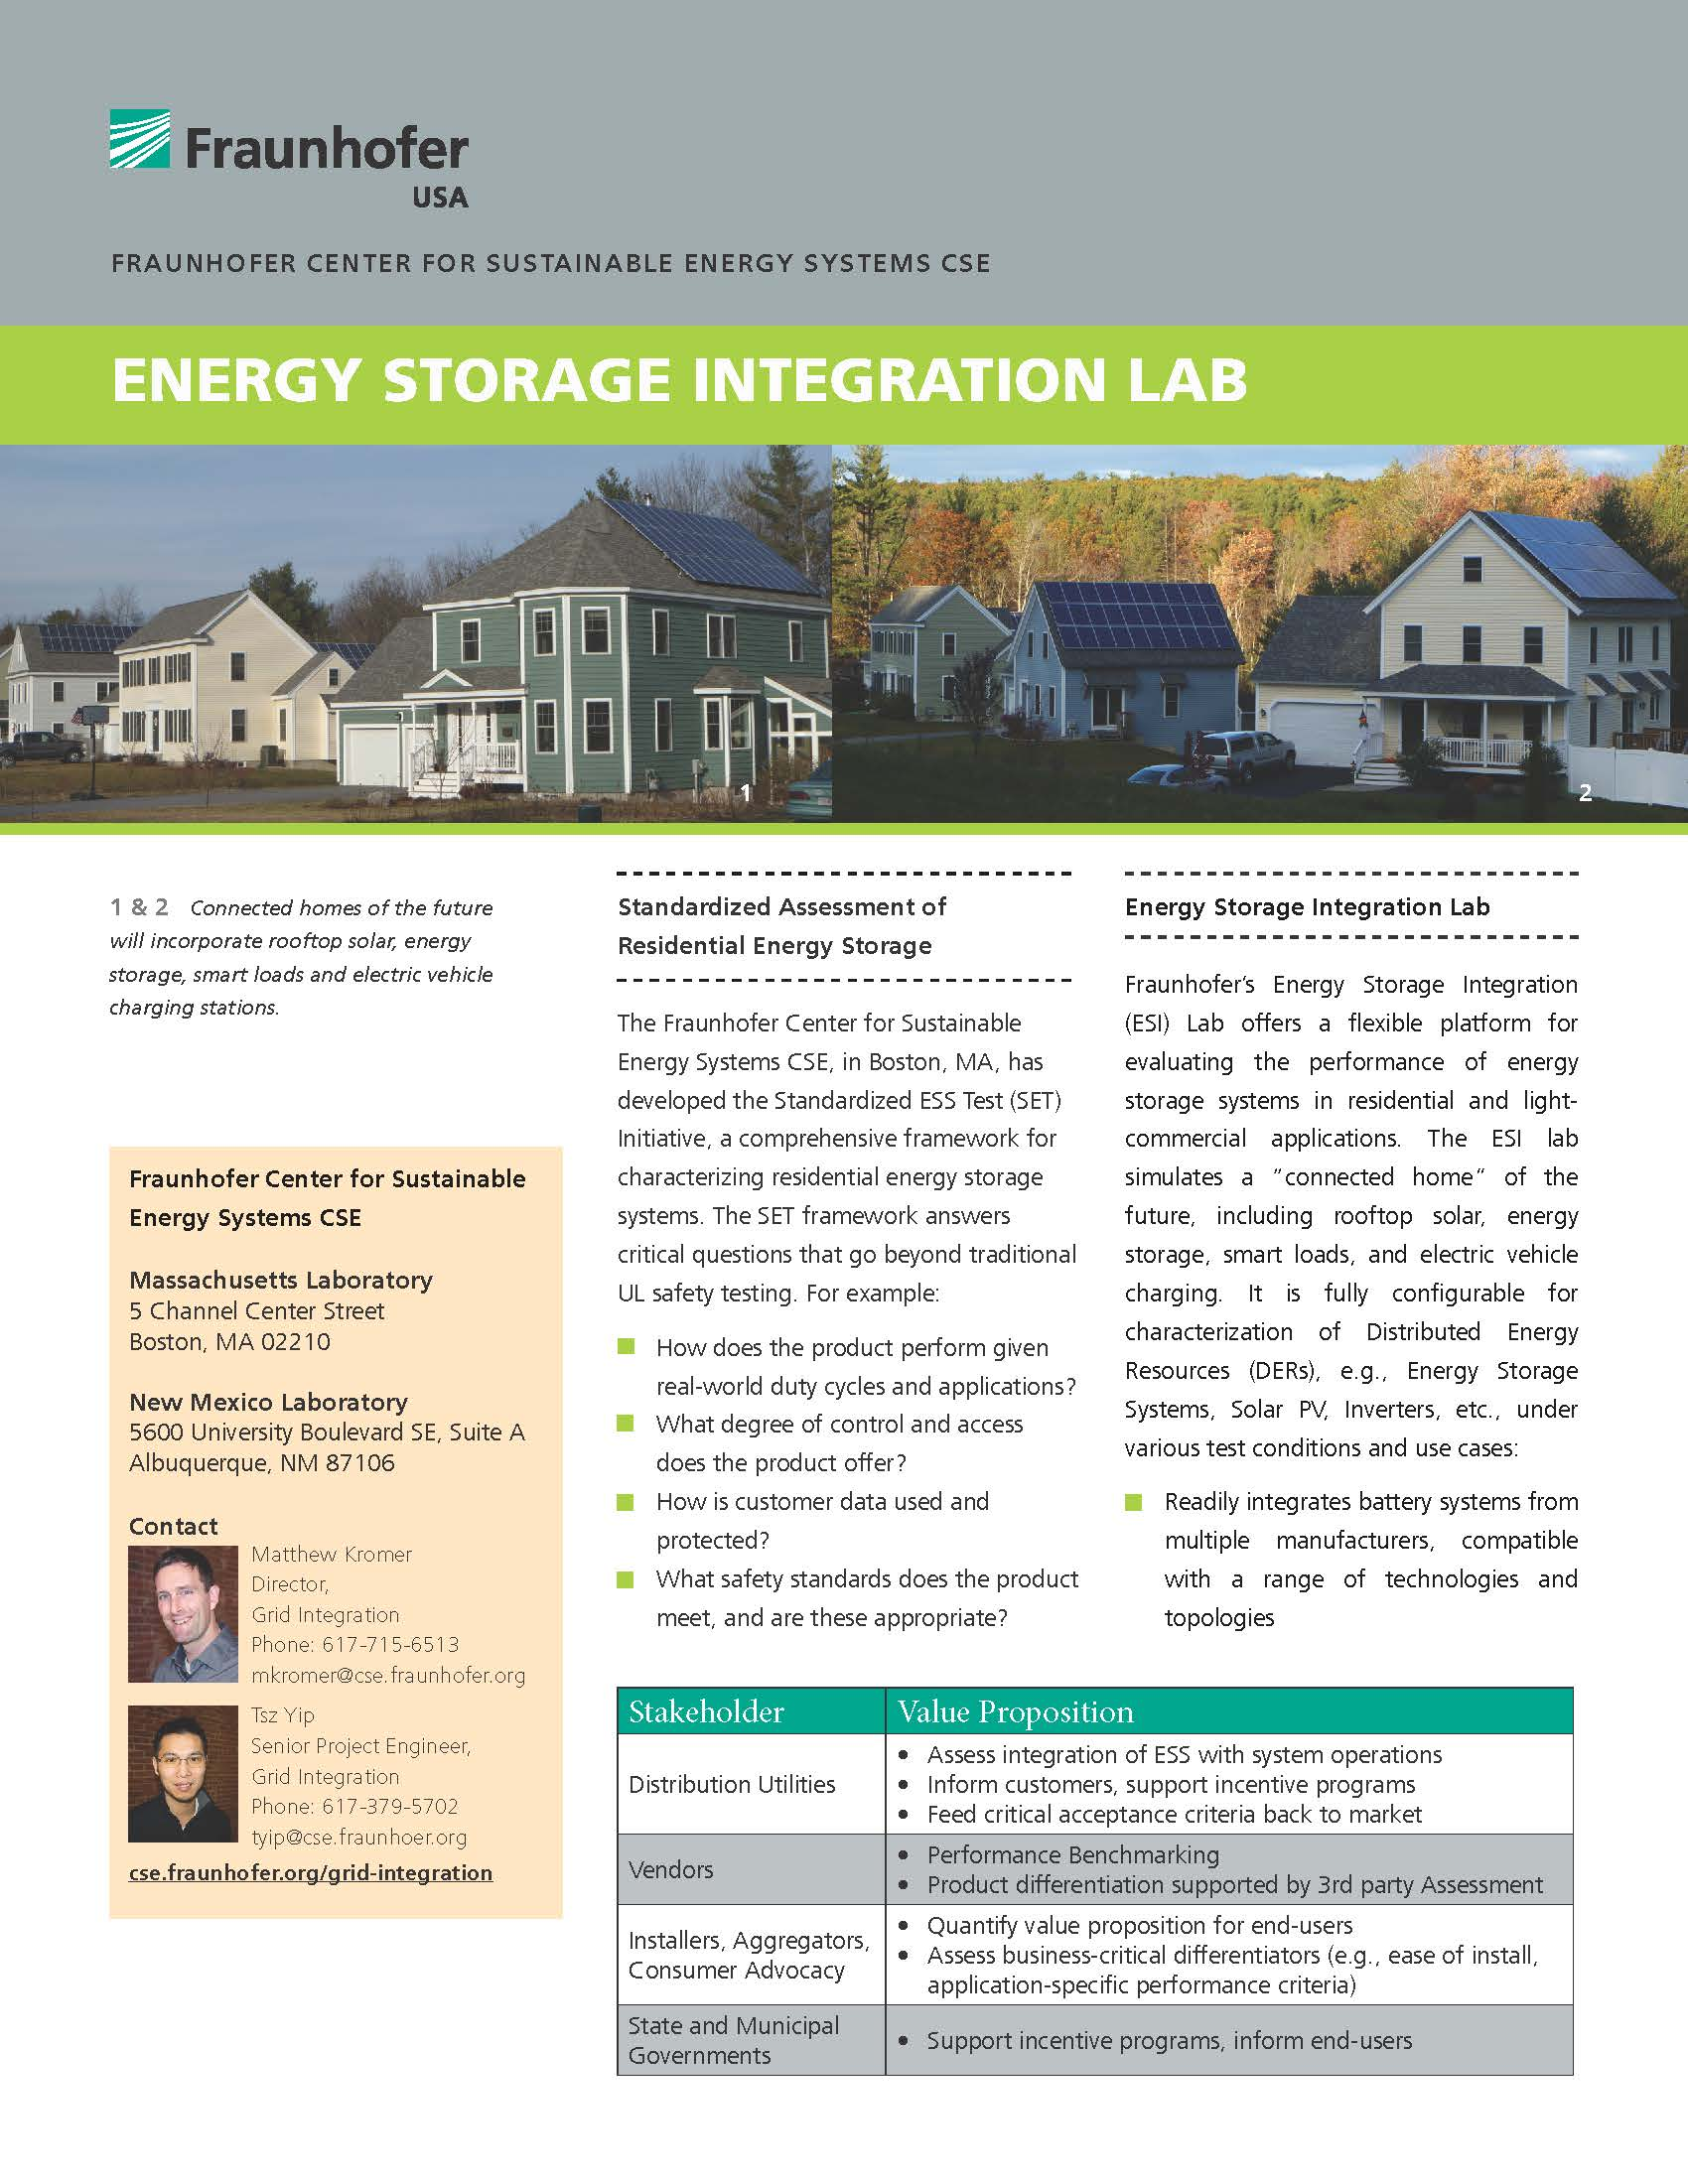 Energy Storage Integration Lab